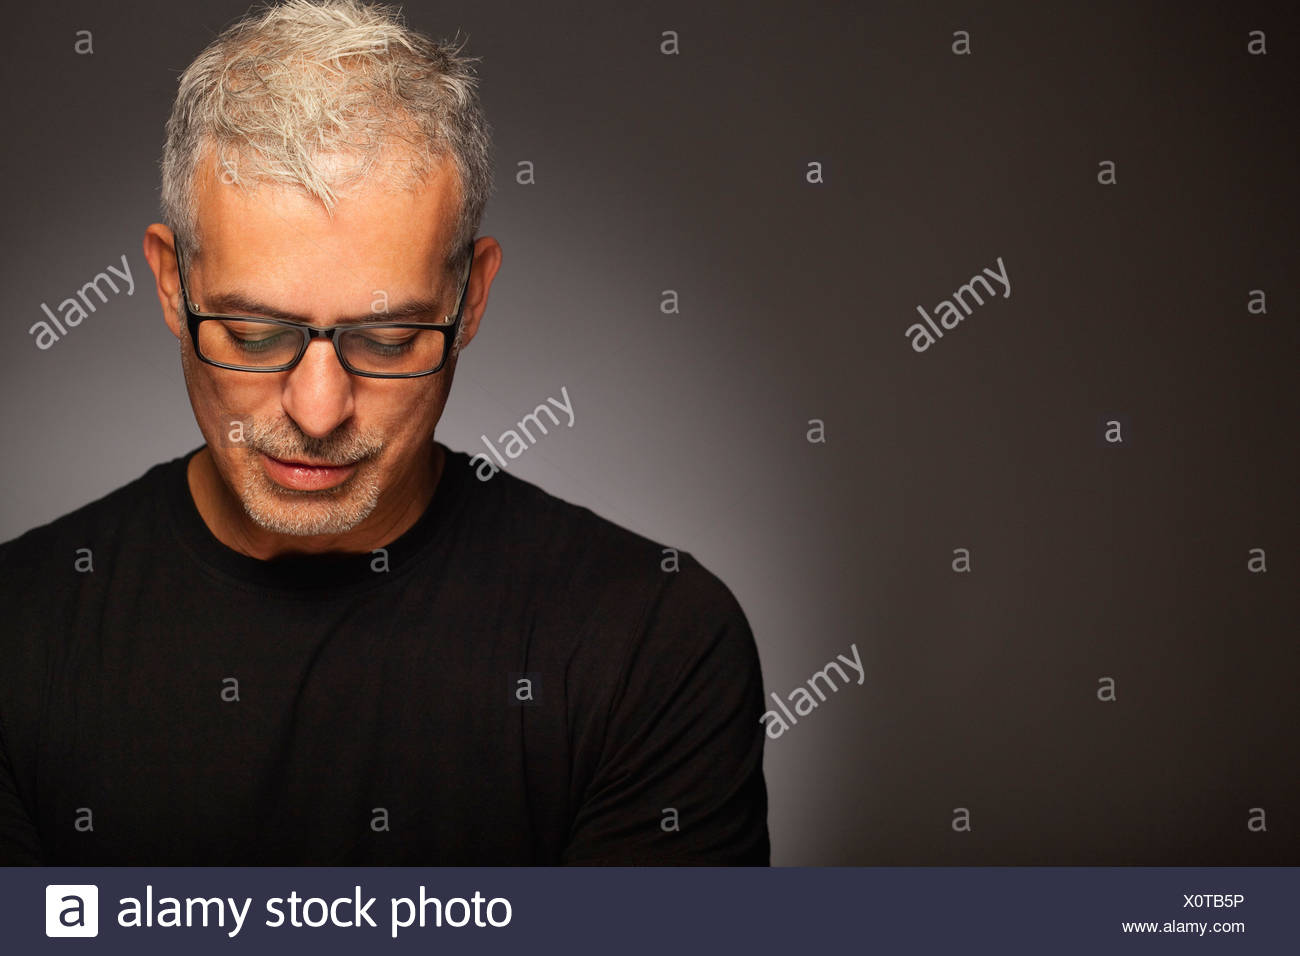 Hombre atractivo retrato sofisticado estilo fresco Foto de stock